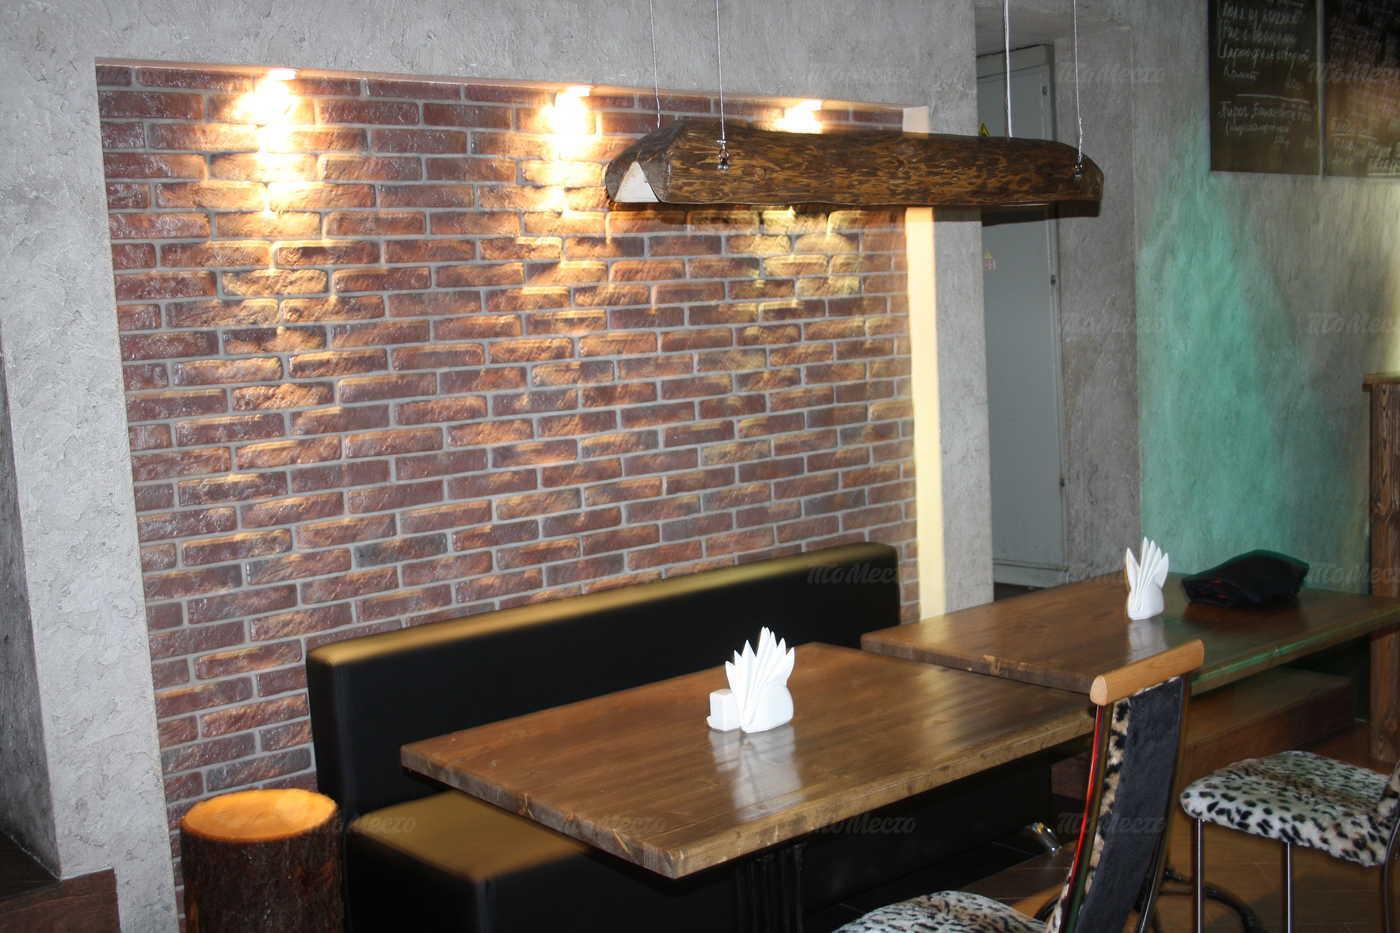 Меню ресторана Снежный Барс на улице Куйбышева